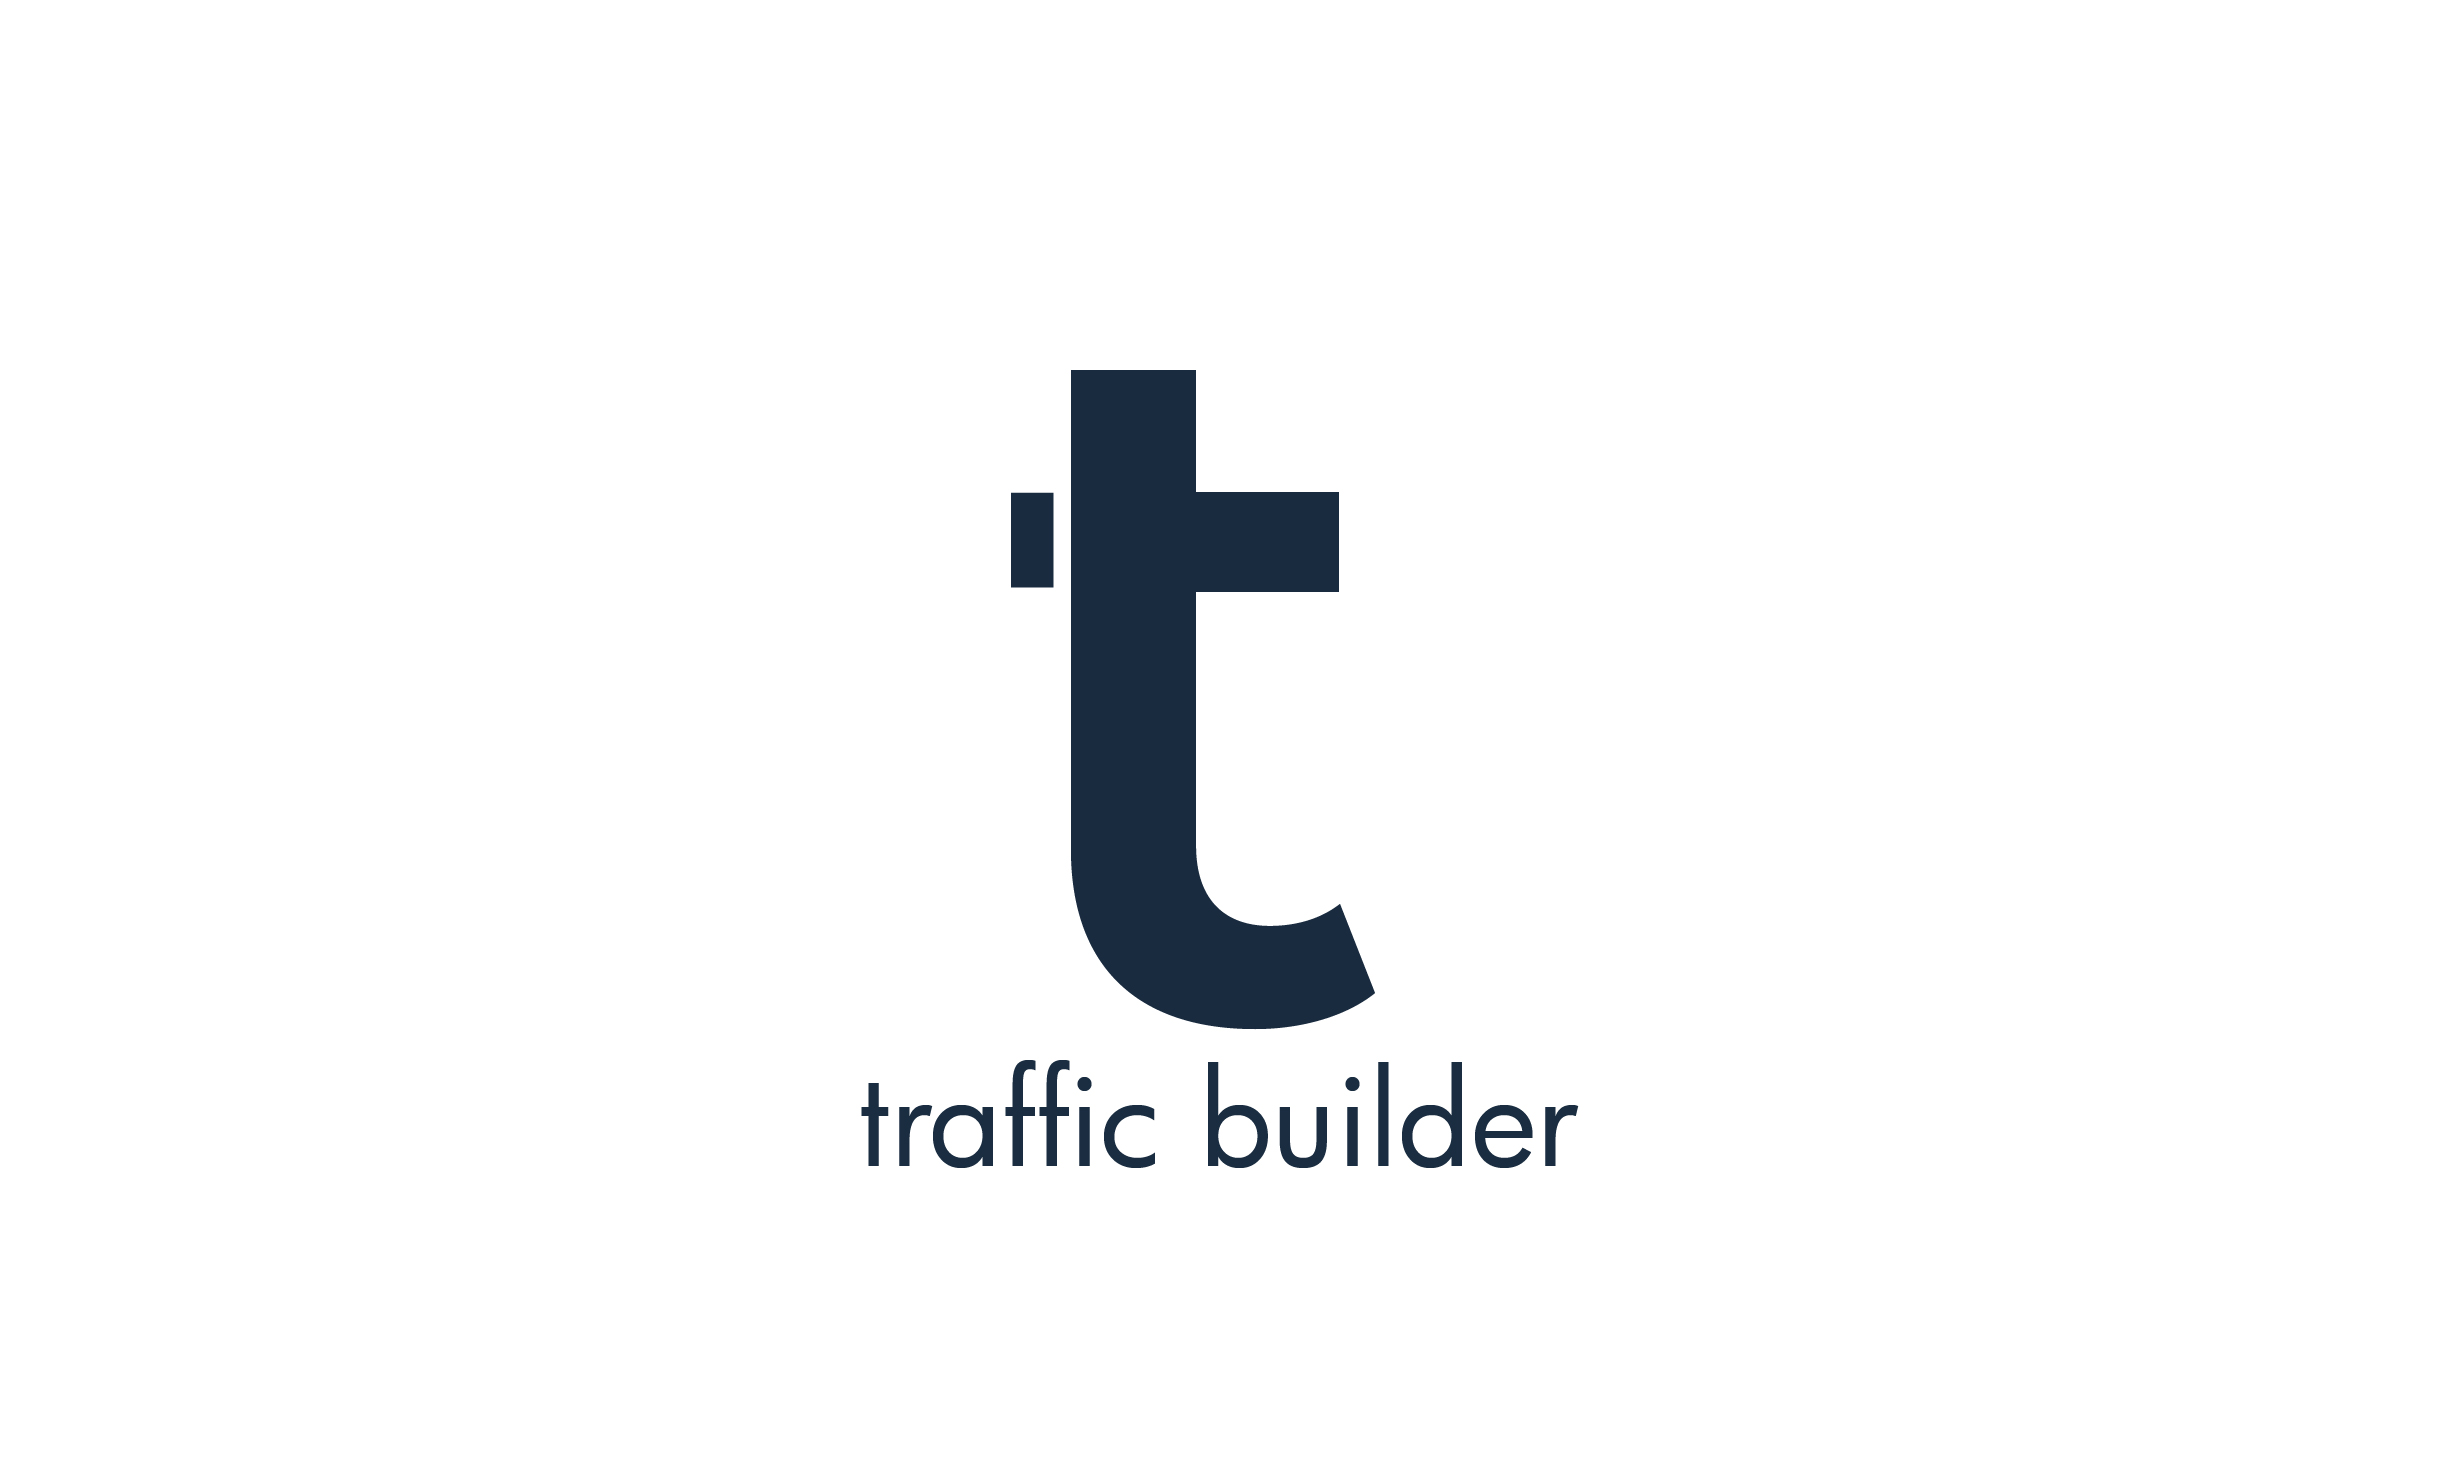 Traffic Builder Traffic Builder Portfolio feature image Traffic Builder 1  Home Portfolio feature image Traffic Builder 1